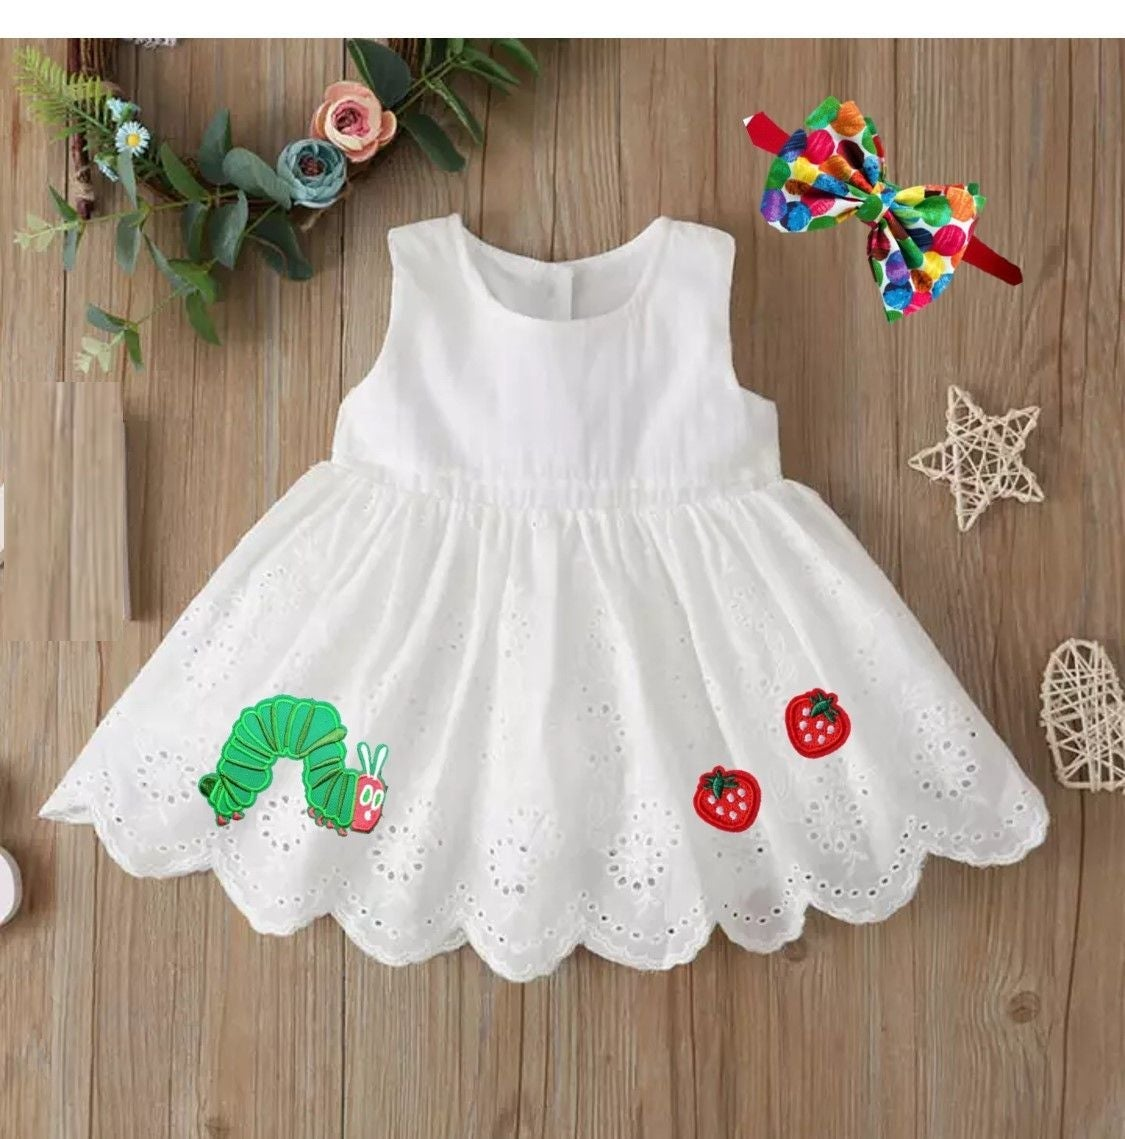 12-18 Hungry caterpillar Birthday dress